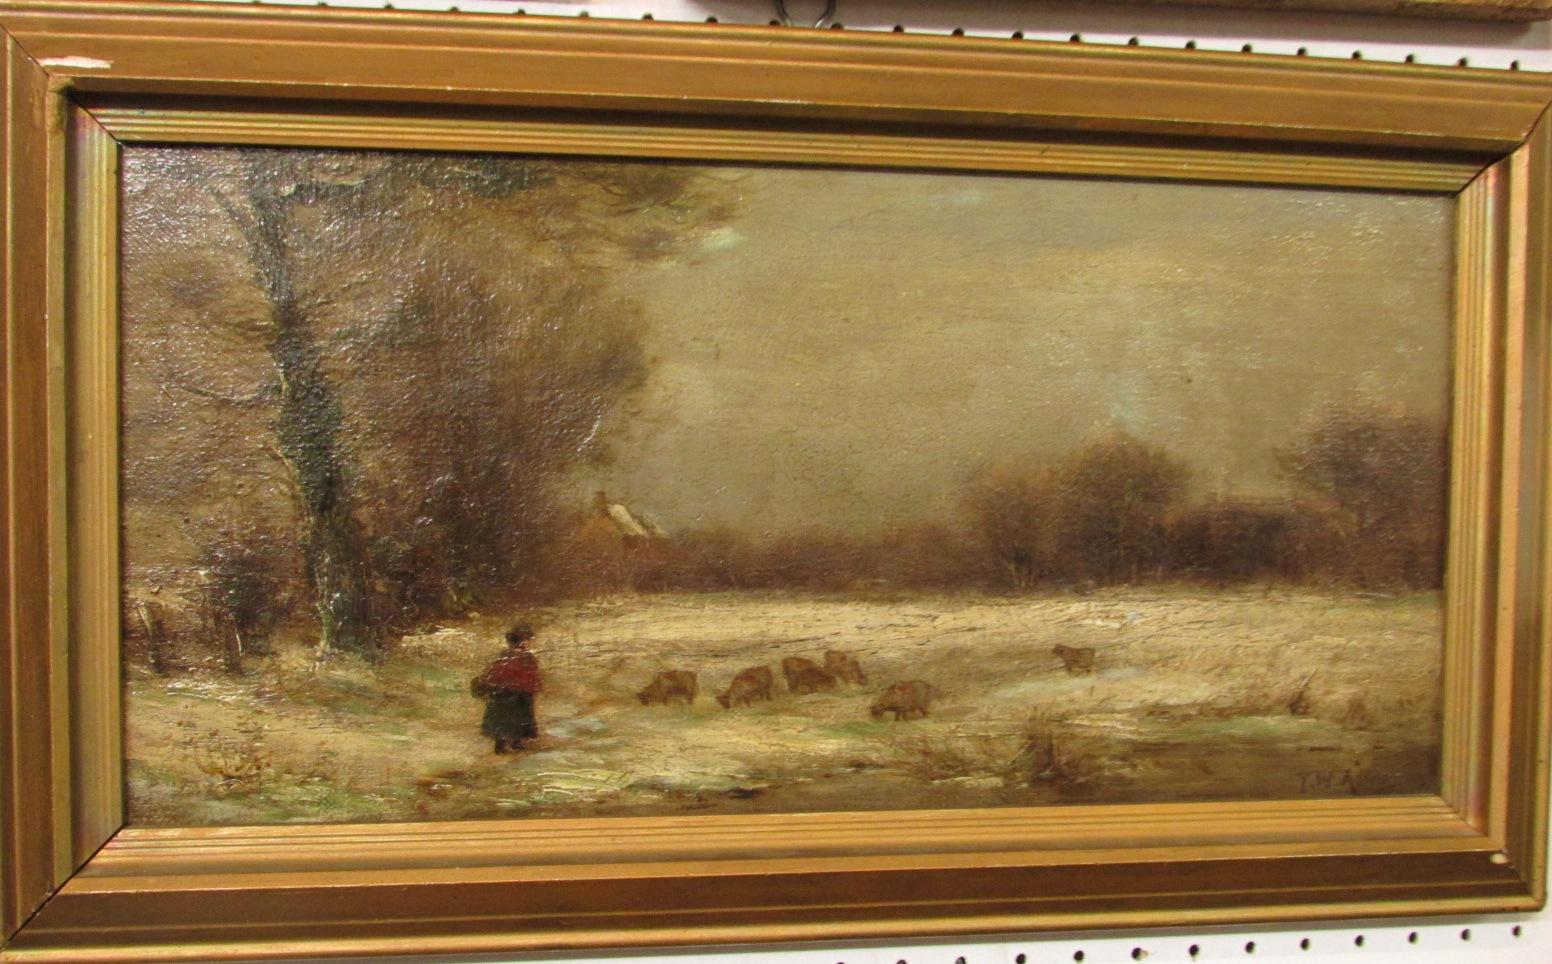 Lot 49 - Shepherdess and sheep in winter landscape, oil on canvas (18.5cm x 38.5cm), signed T.W. Allen